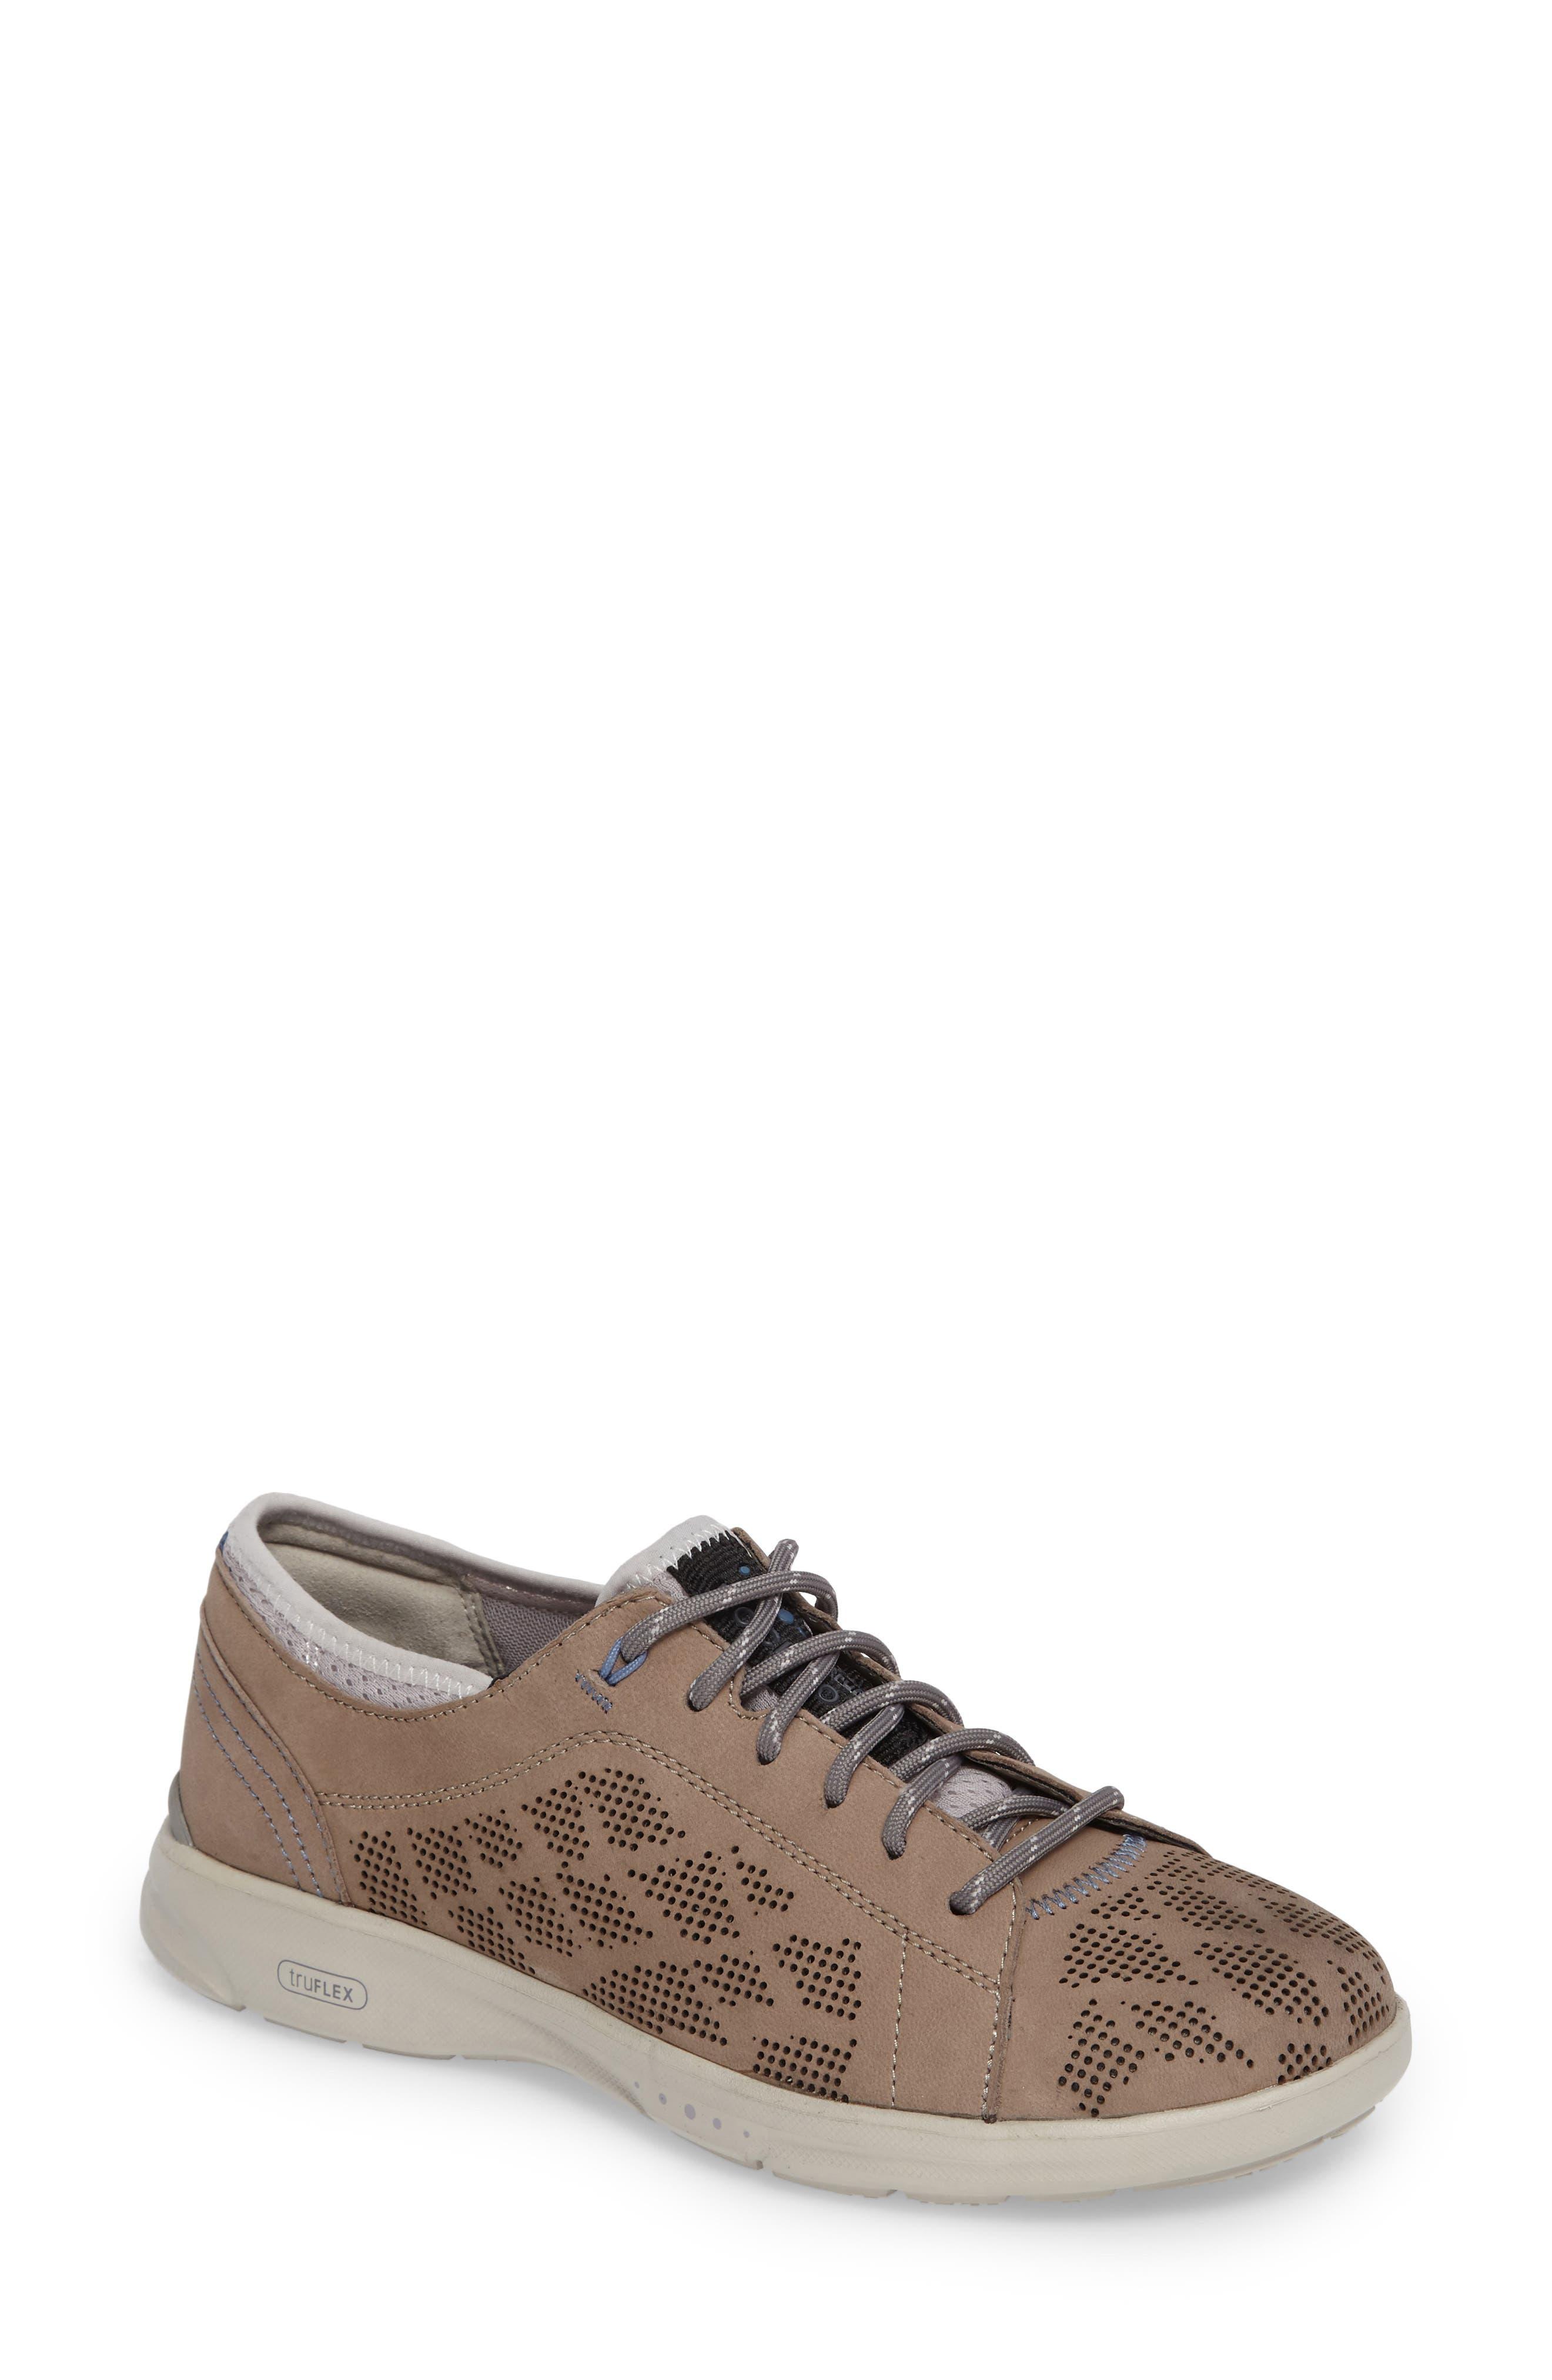 Main Image - Rockport truFLEX Perforated Sneaker (Women)